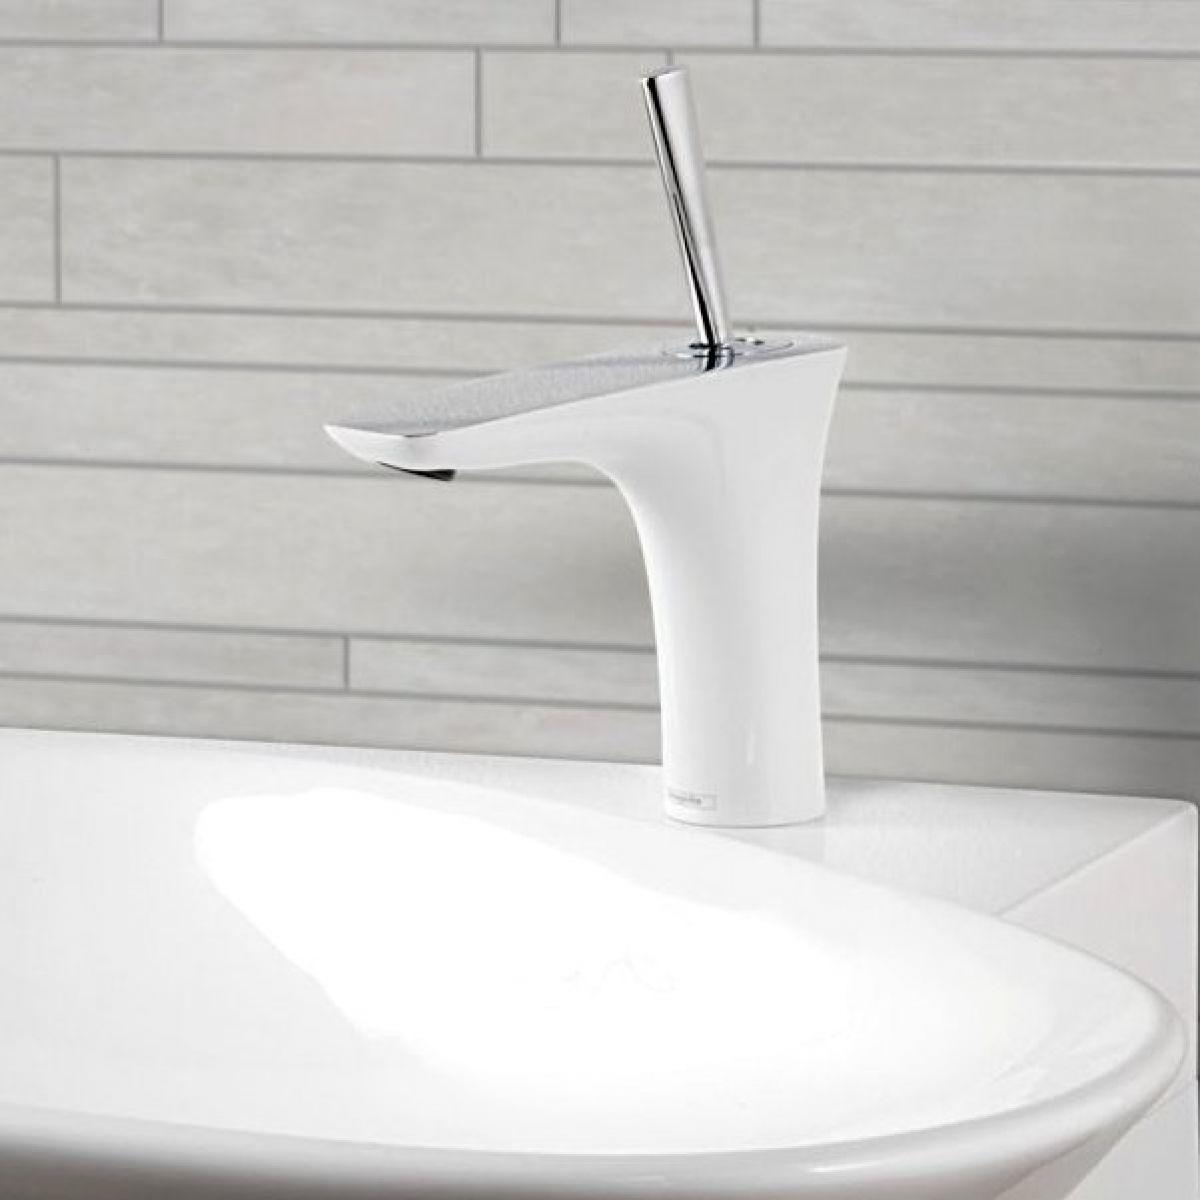 Hansgrohe PuraVida Basin Mixer 110 | Bathrooms Direct Yorkshire